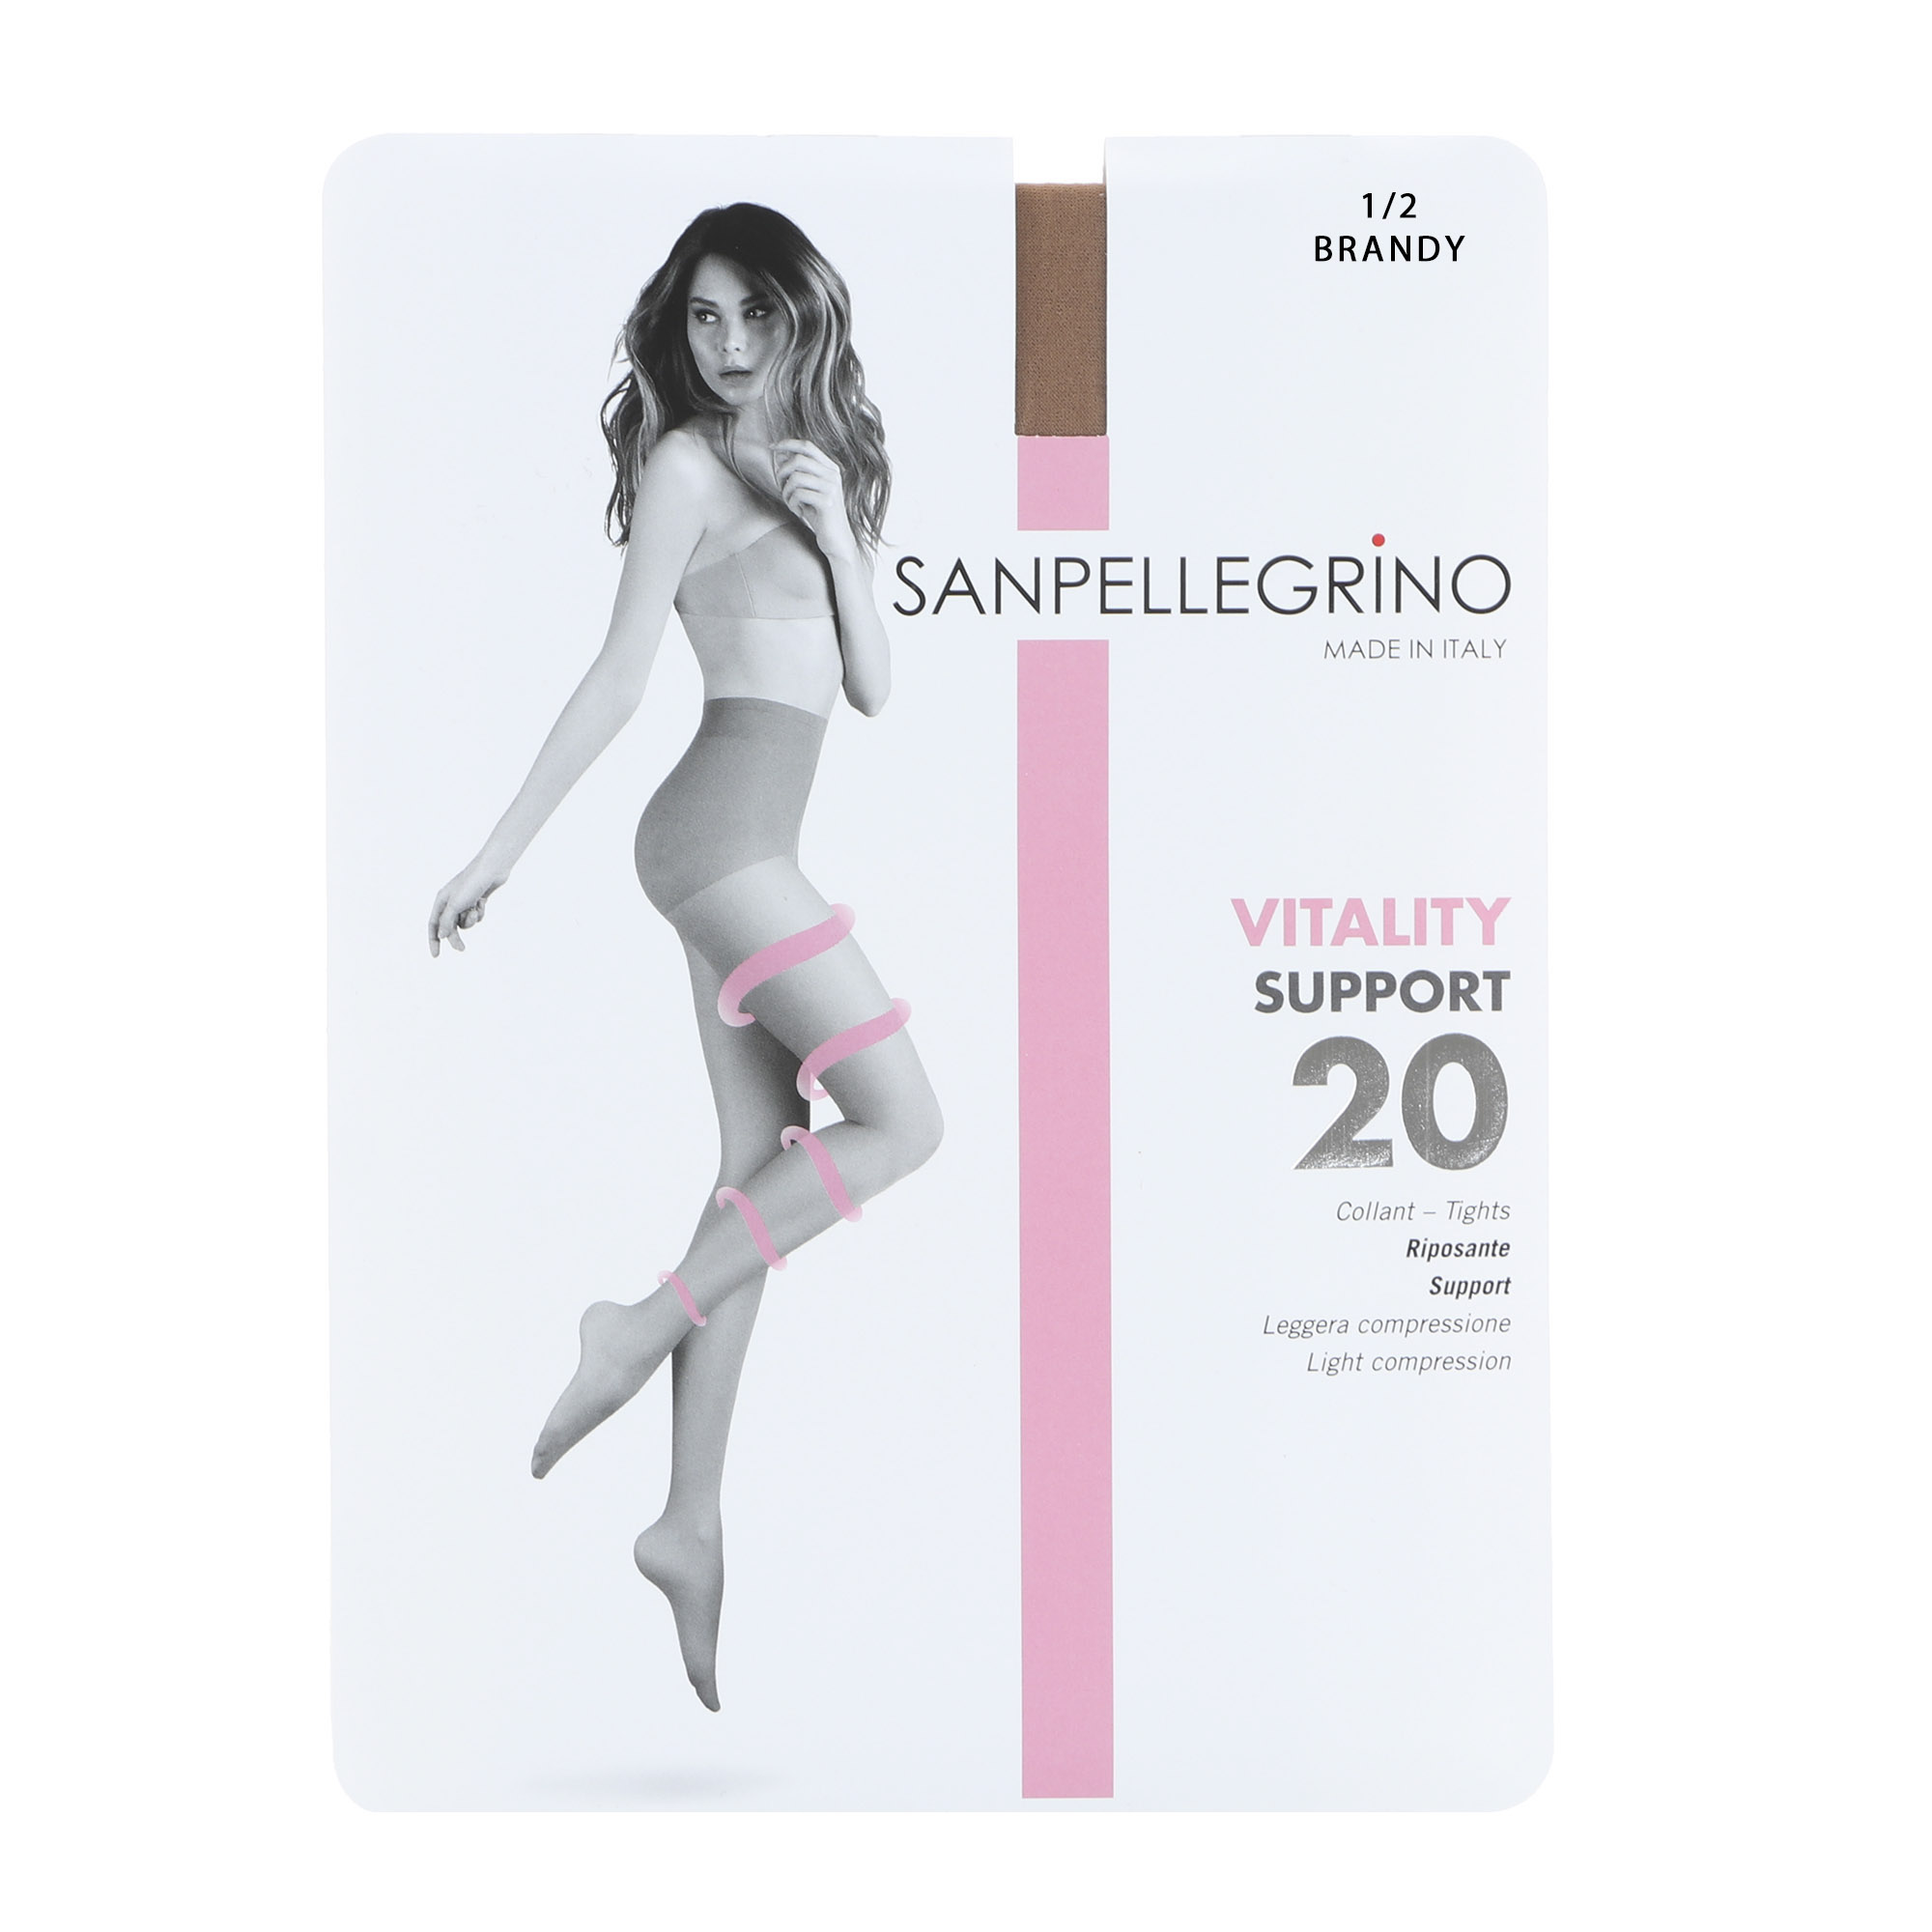 Колготки Sanpellegrino Support 20 Comfort Brandy S/M недорого